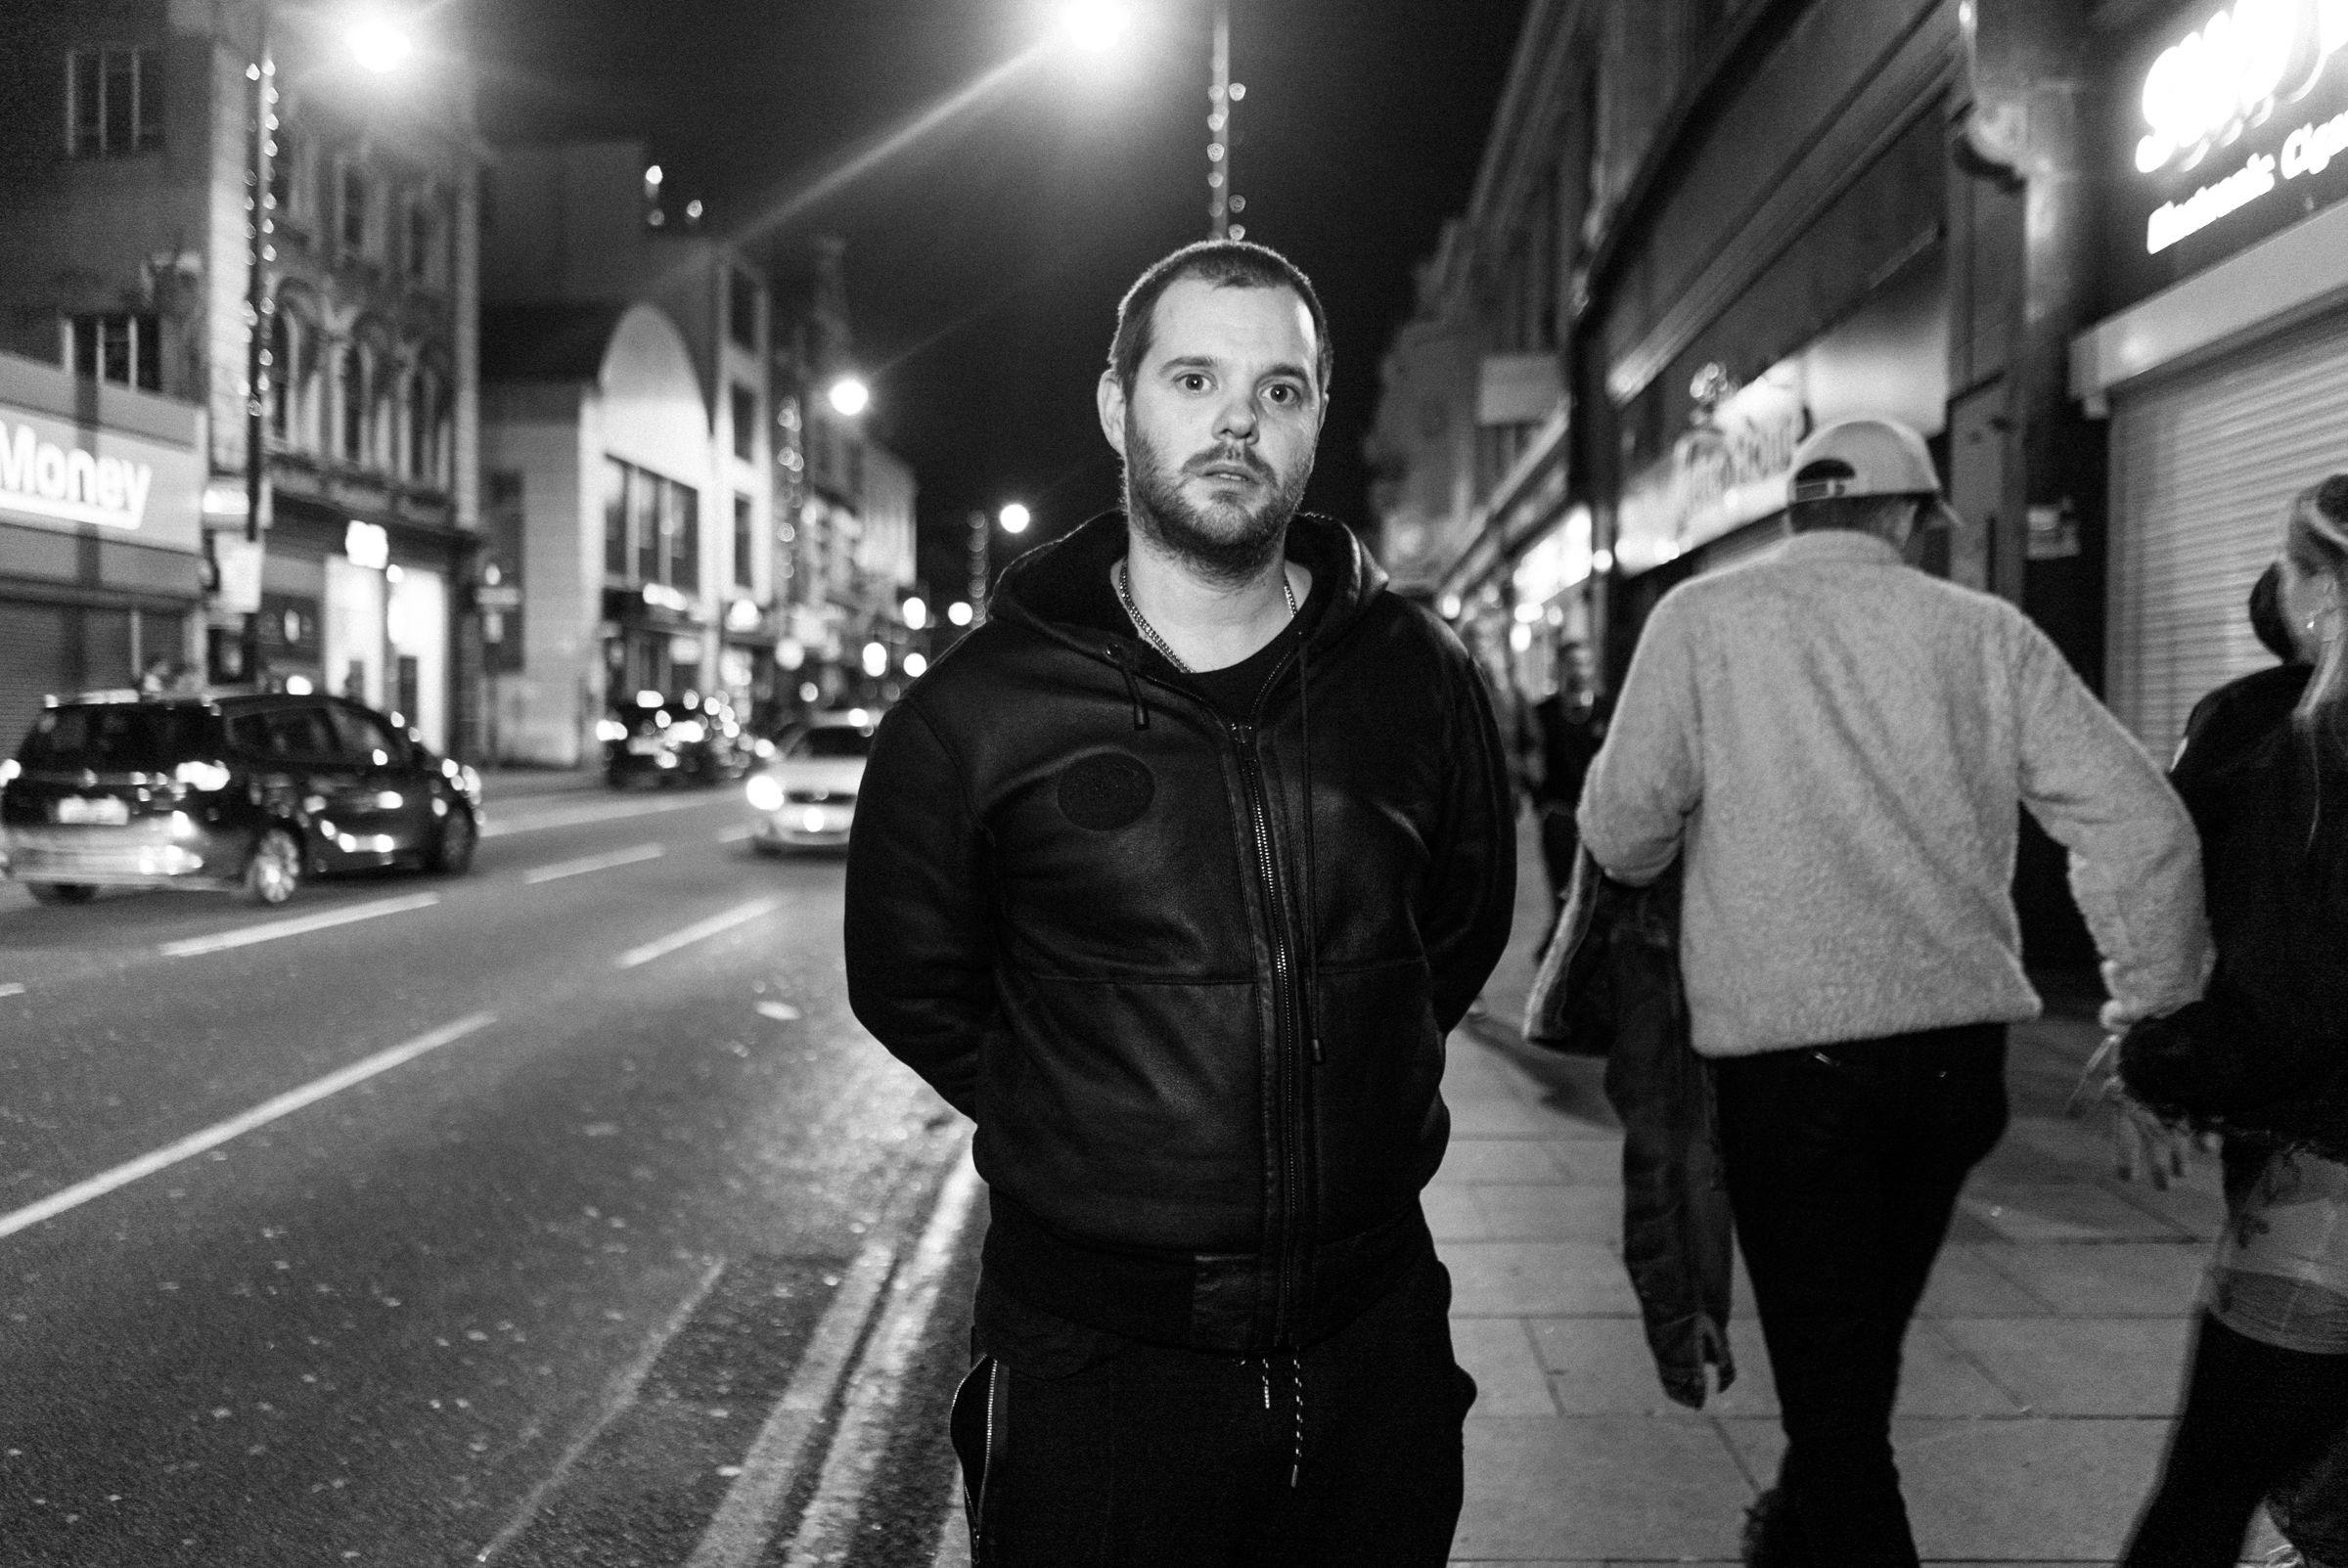 Mike Skinner: The Streets x Foot Patrol